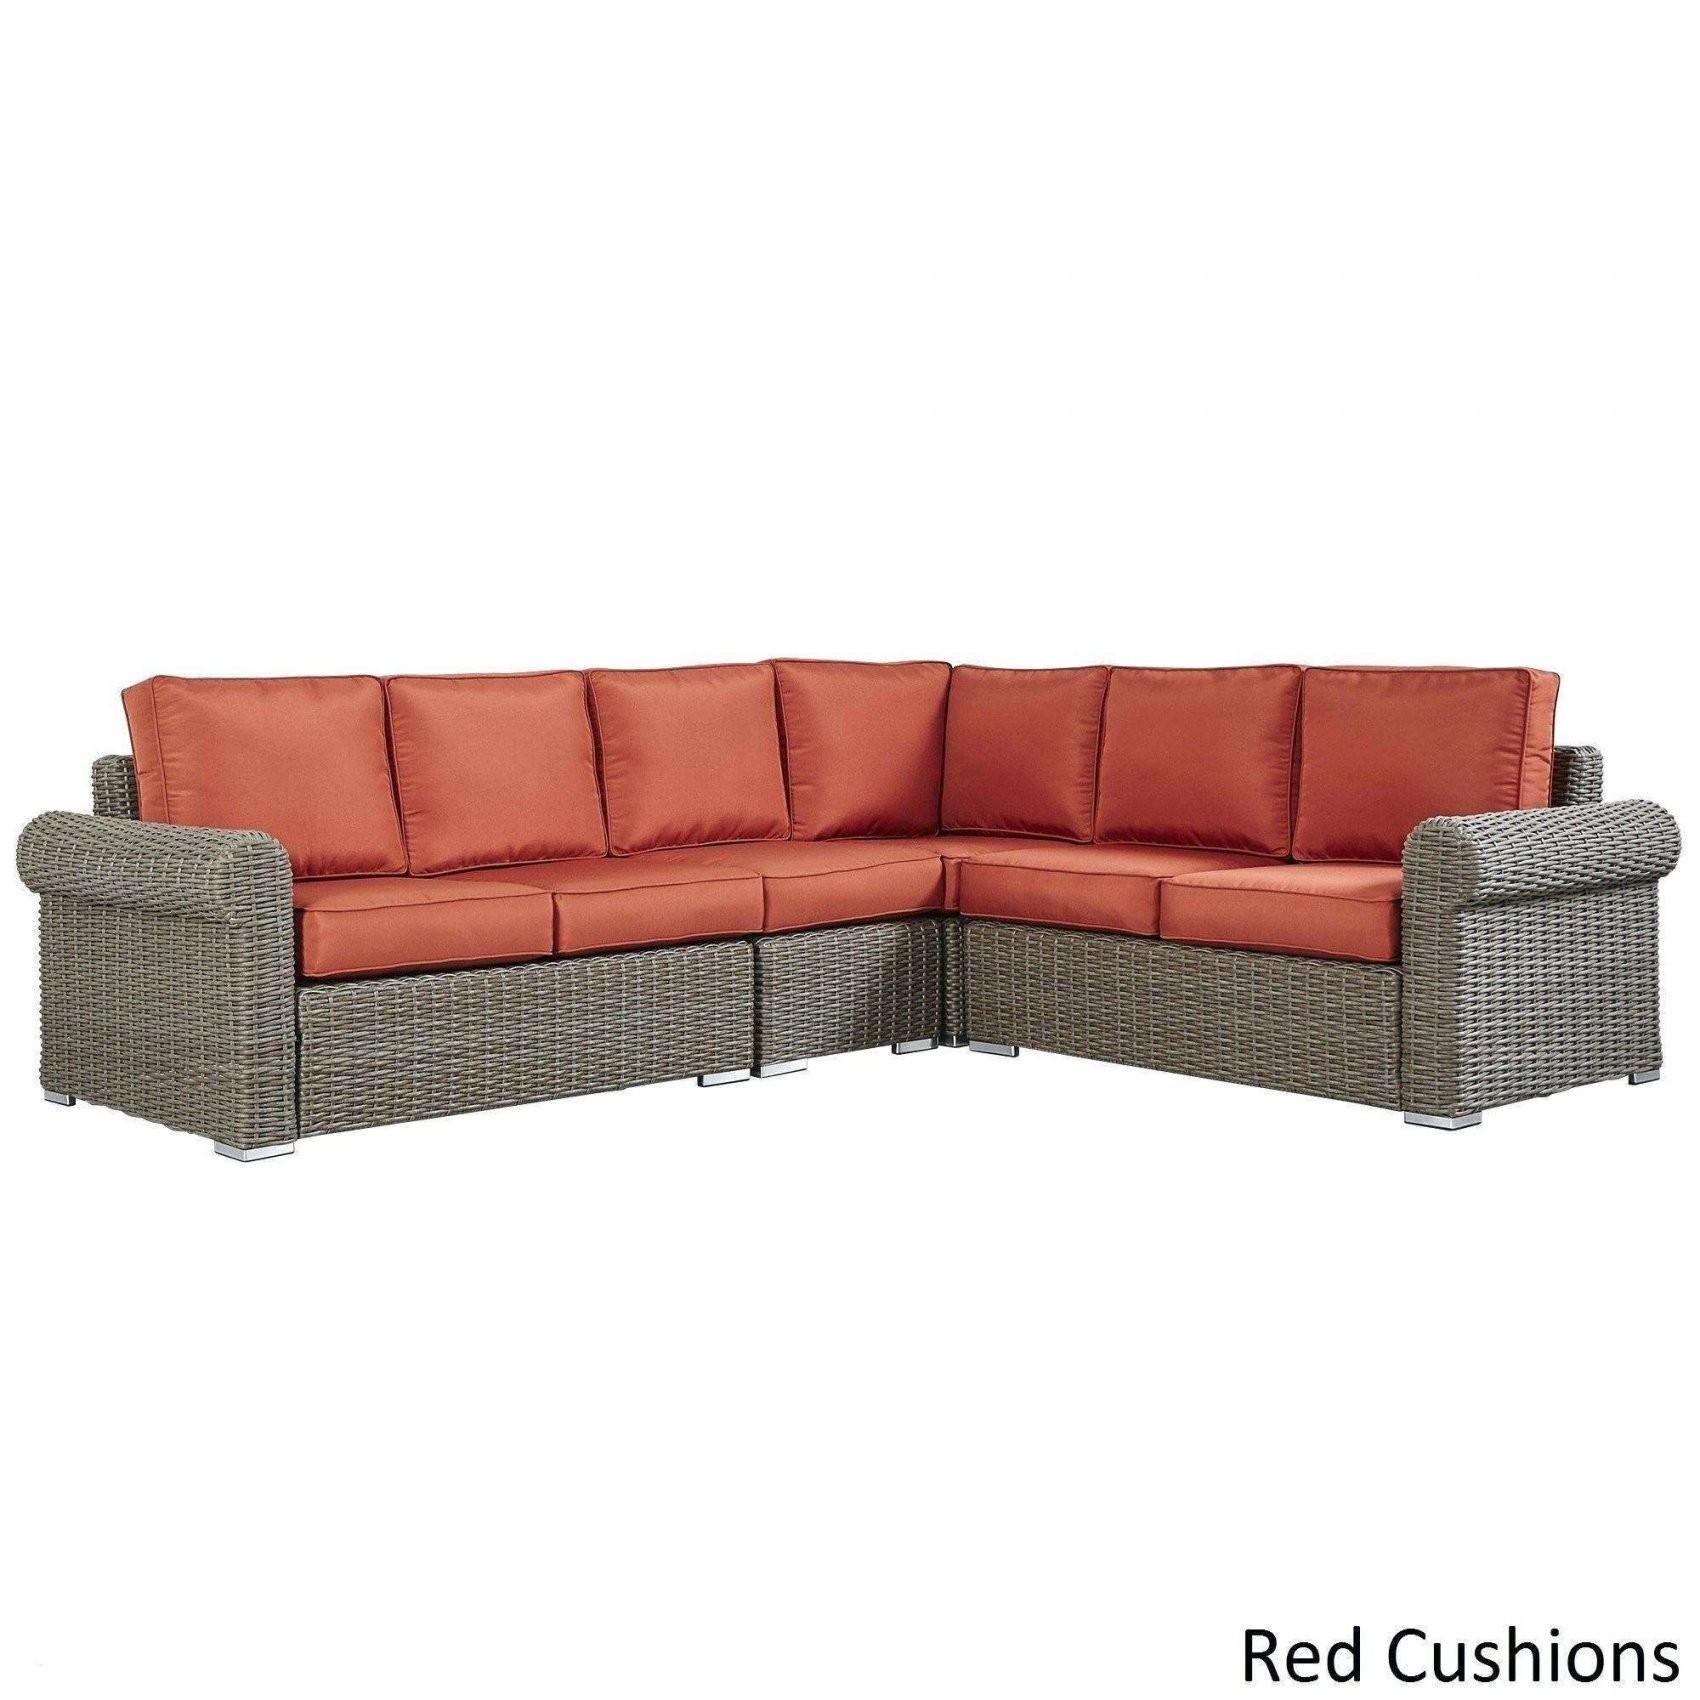 17 Agreeable Two Seater Sofa Snapshots  Lidocain von Lounge Sofa 2 Sitzer Outdoor Bild